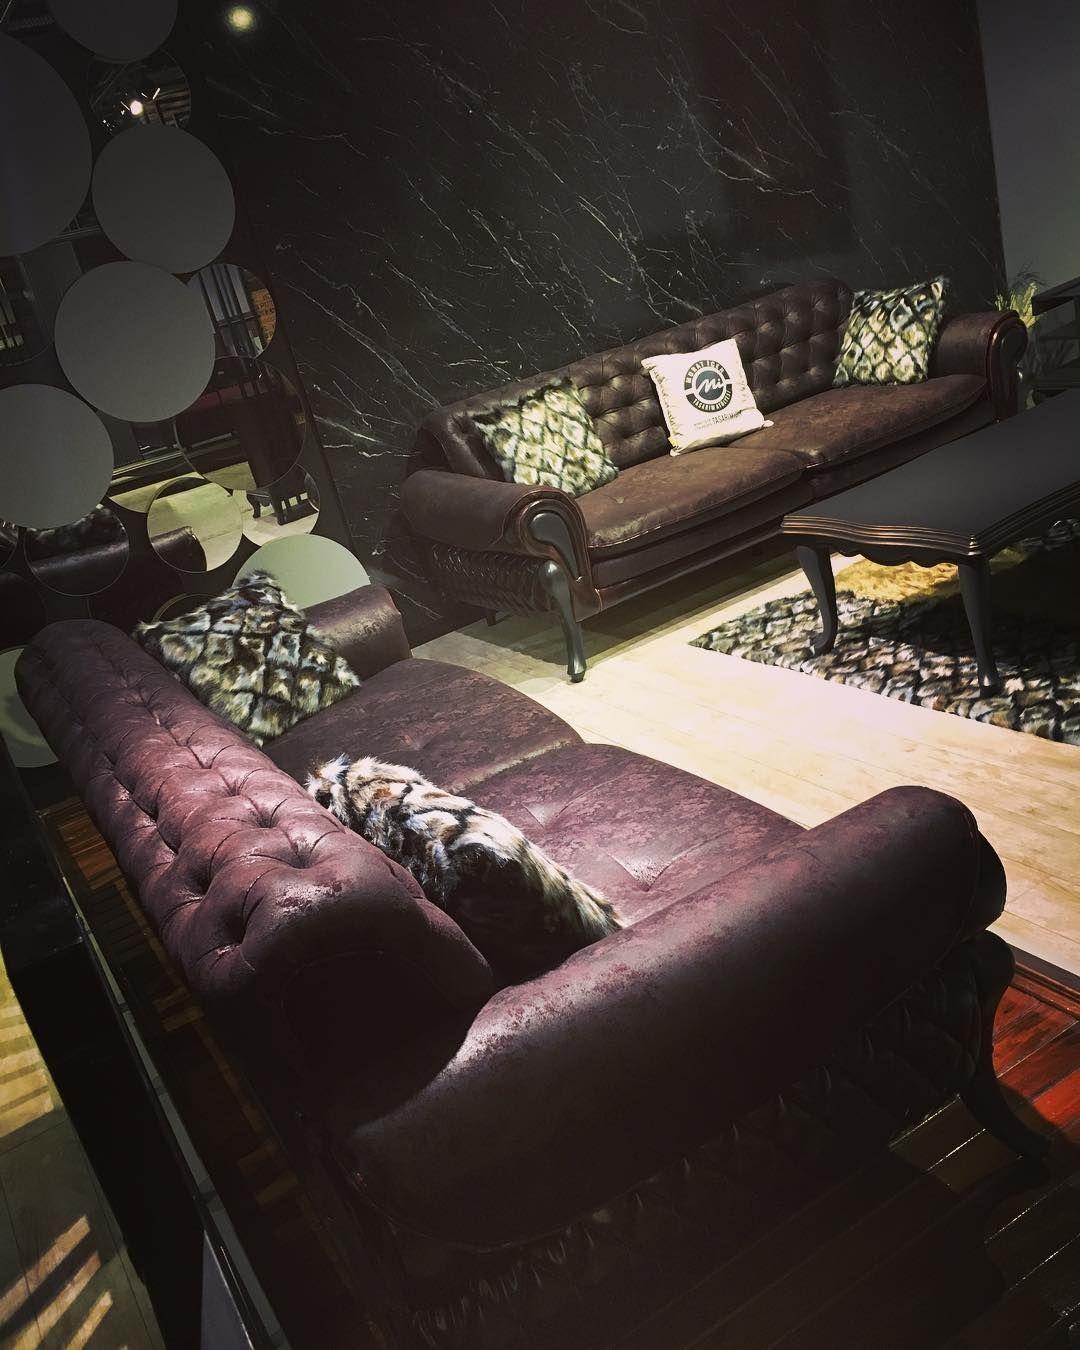 New The 10 Best Home Decor With Pictures Trend Koltuk Takimi Mobilya Koltuktakimi Mobilyadekorasyon Mobiliyum Ceyiz Ye Furniture Decor Home Decor